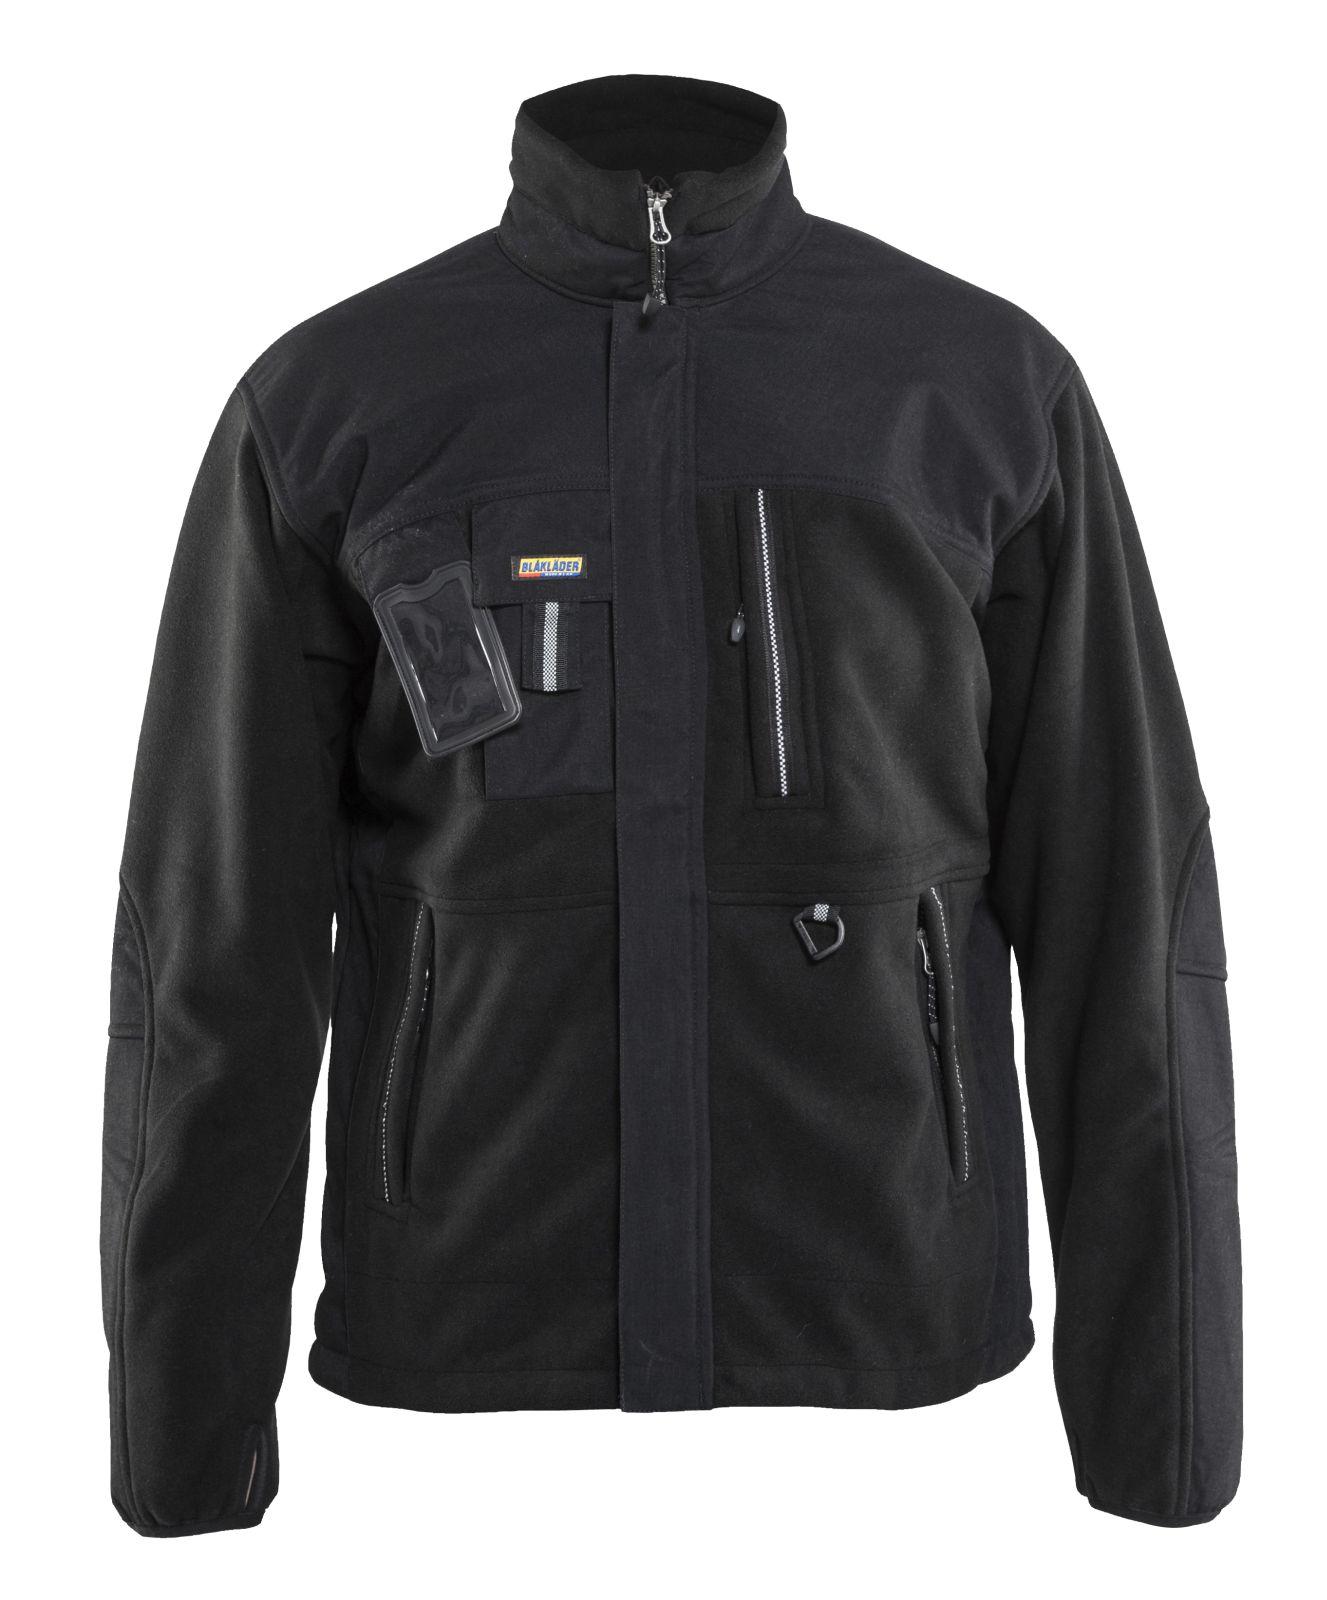 Blaklader Fleece jassen 48352520 zwart(9900)